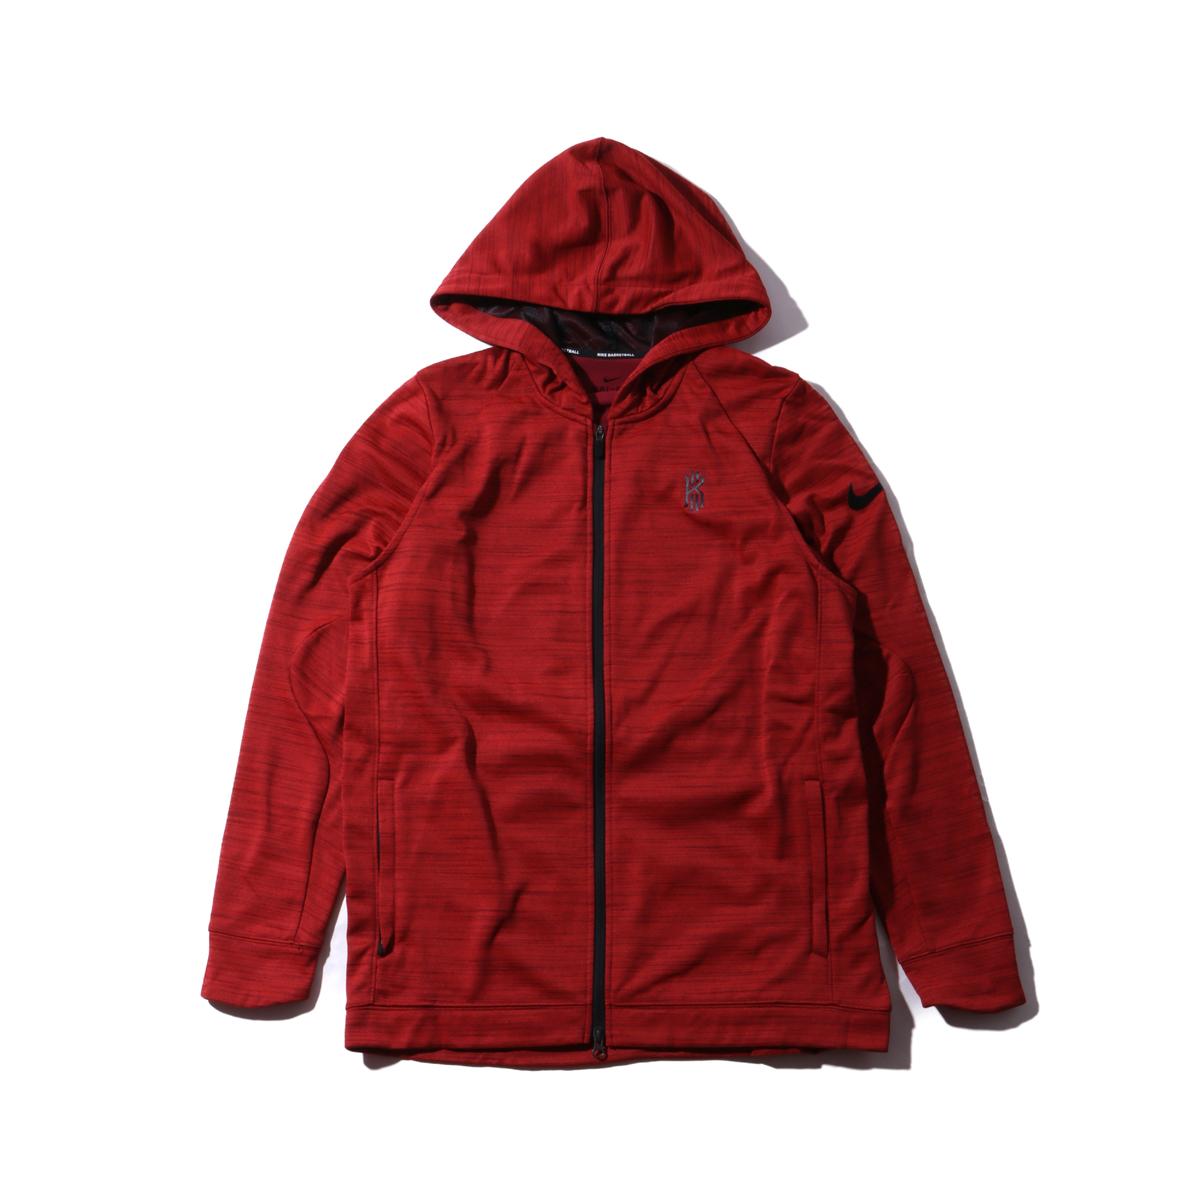 NIKE KYRIE M NK THRMA JKT HD HPRELT(ナイキ カイリー ハイパーエリート フーディ ジャケット)RED【メンズ ジャケット】17SP-I